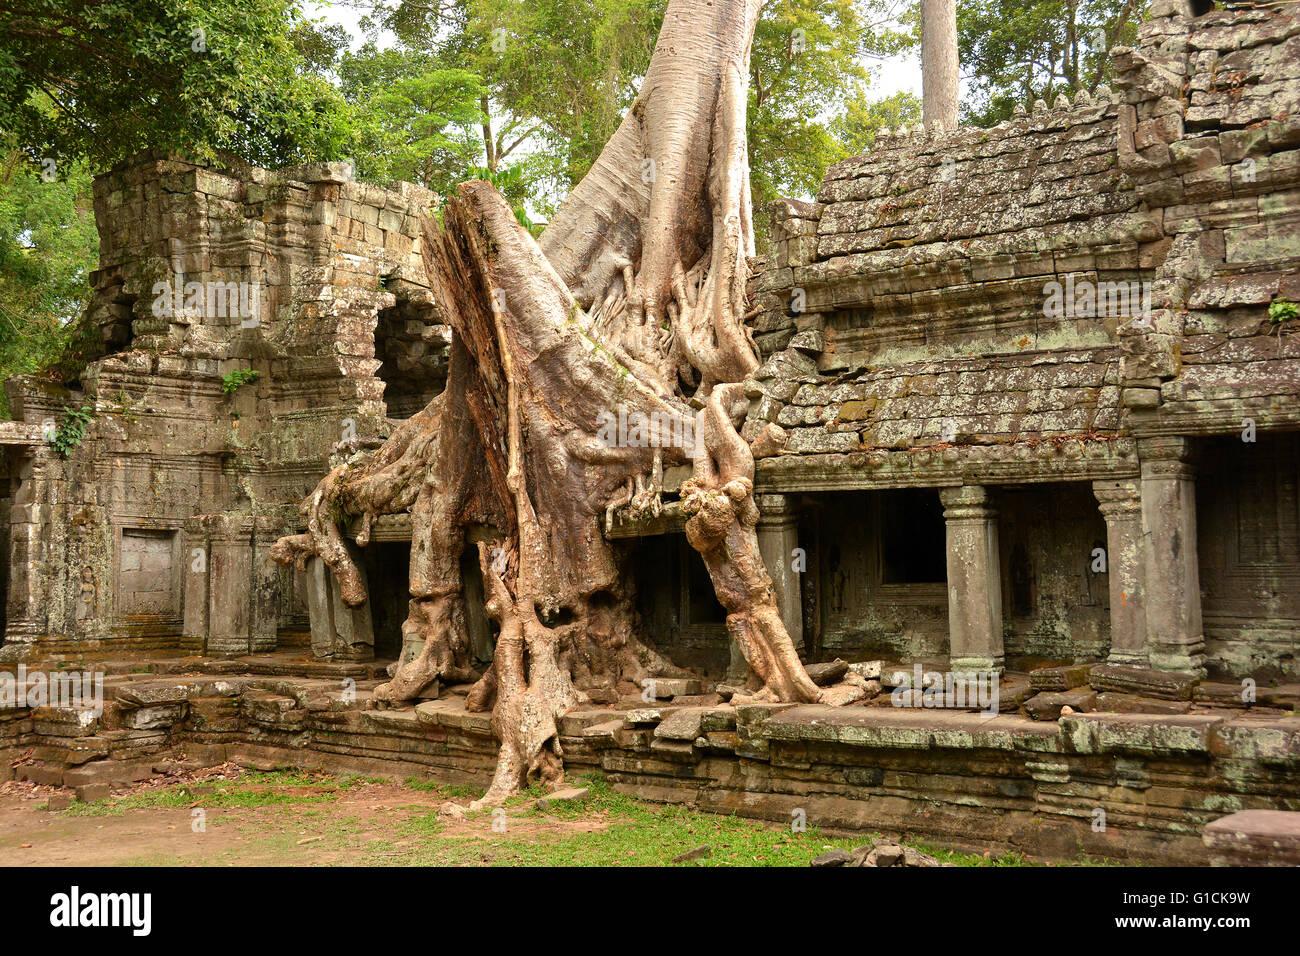 Komplizierte Baumwurzeln im Ta Prohm Tempel. 12. Jahrhundert; Siem Reap, Kambodscha. Stockbild